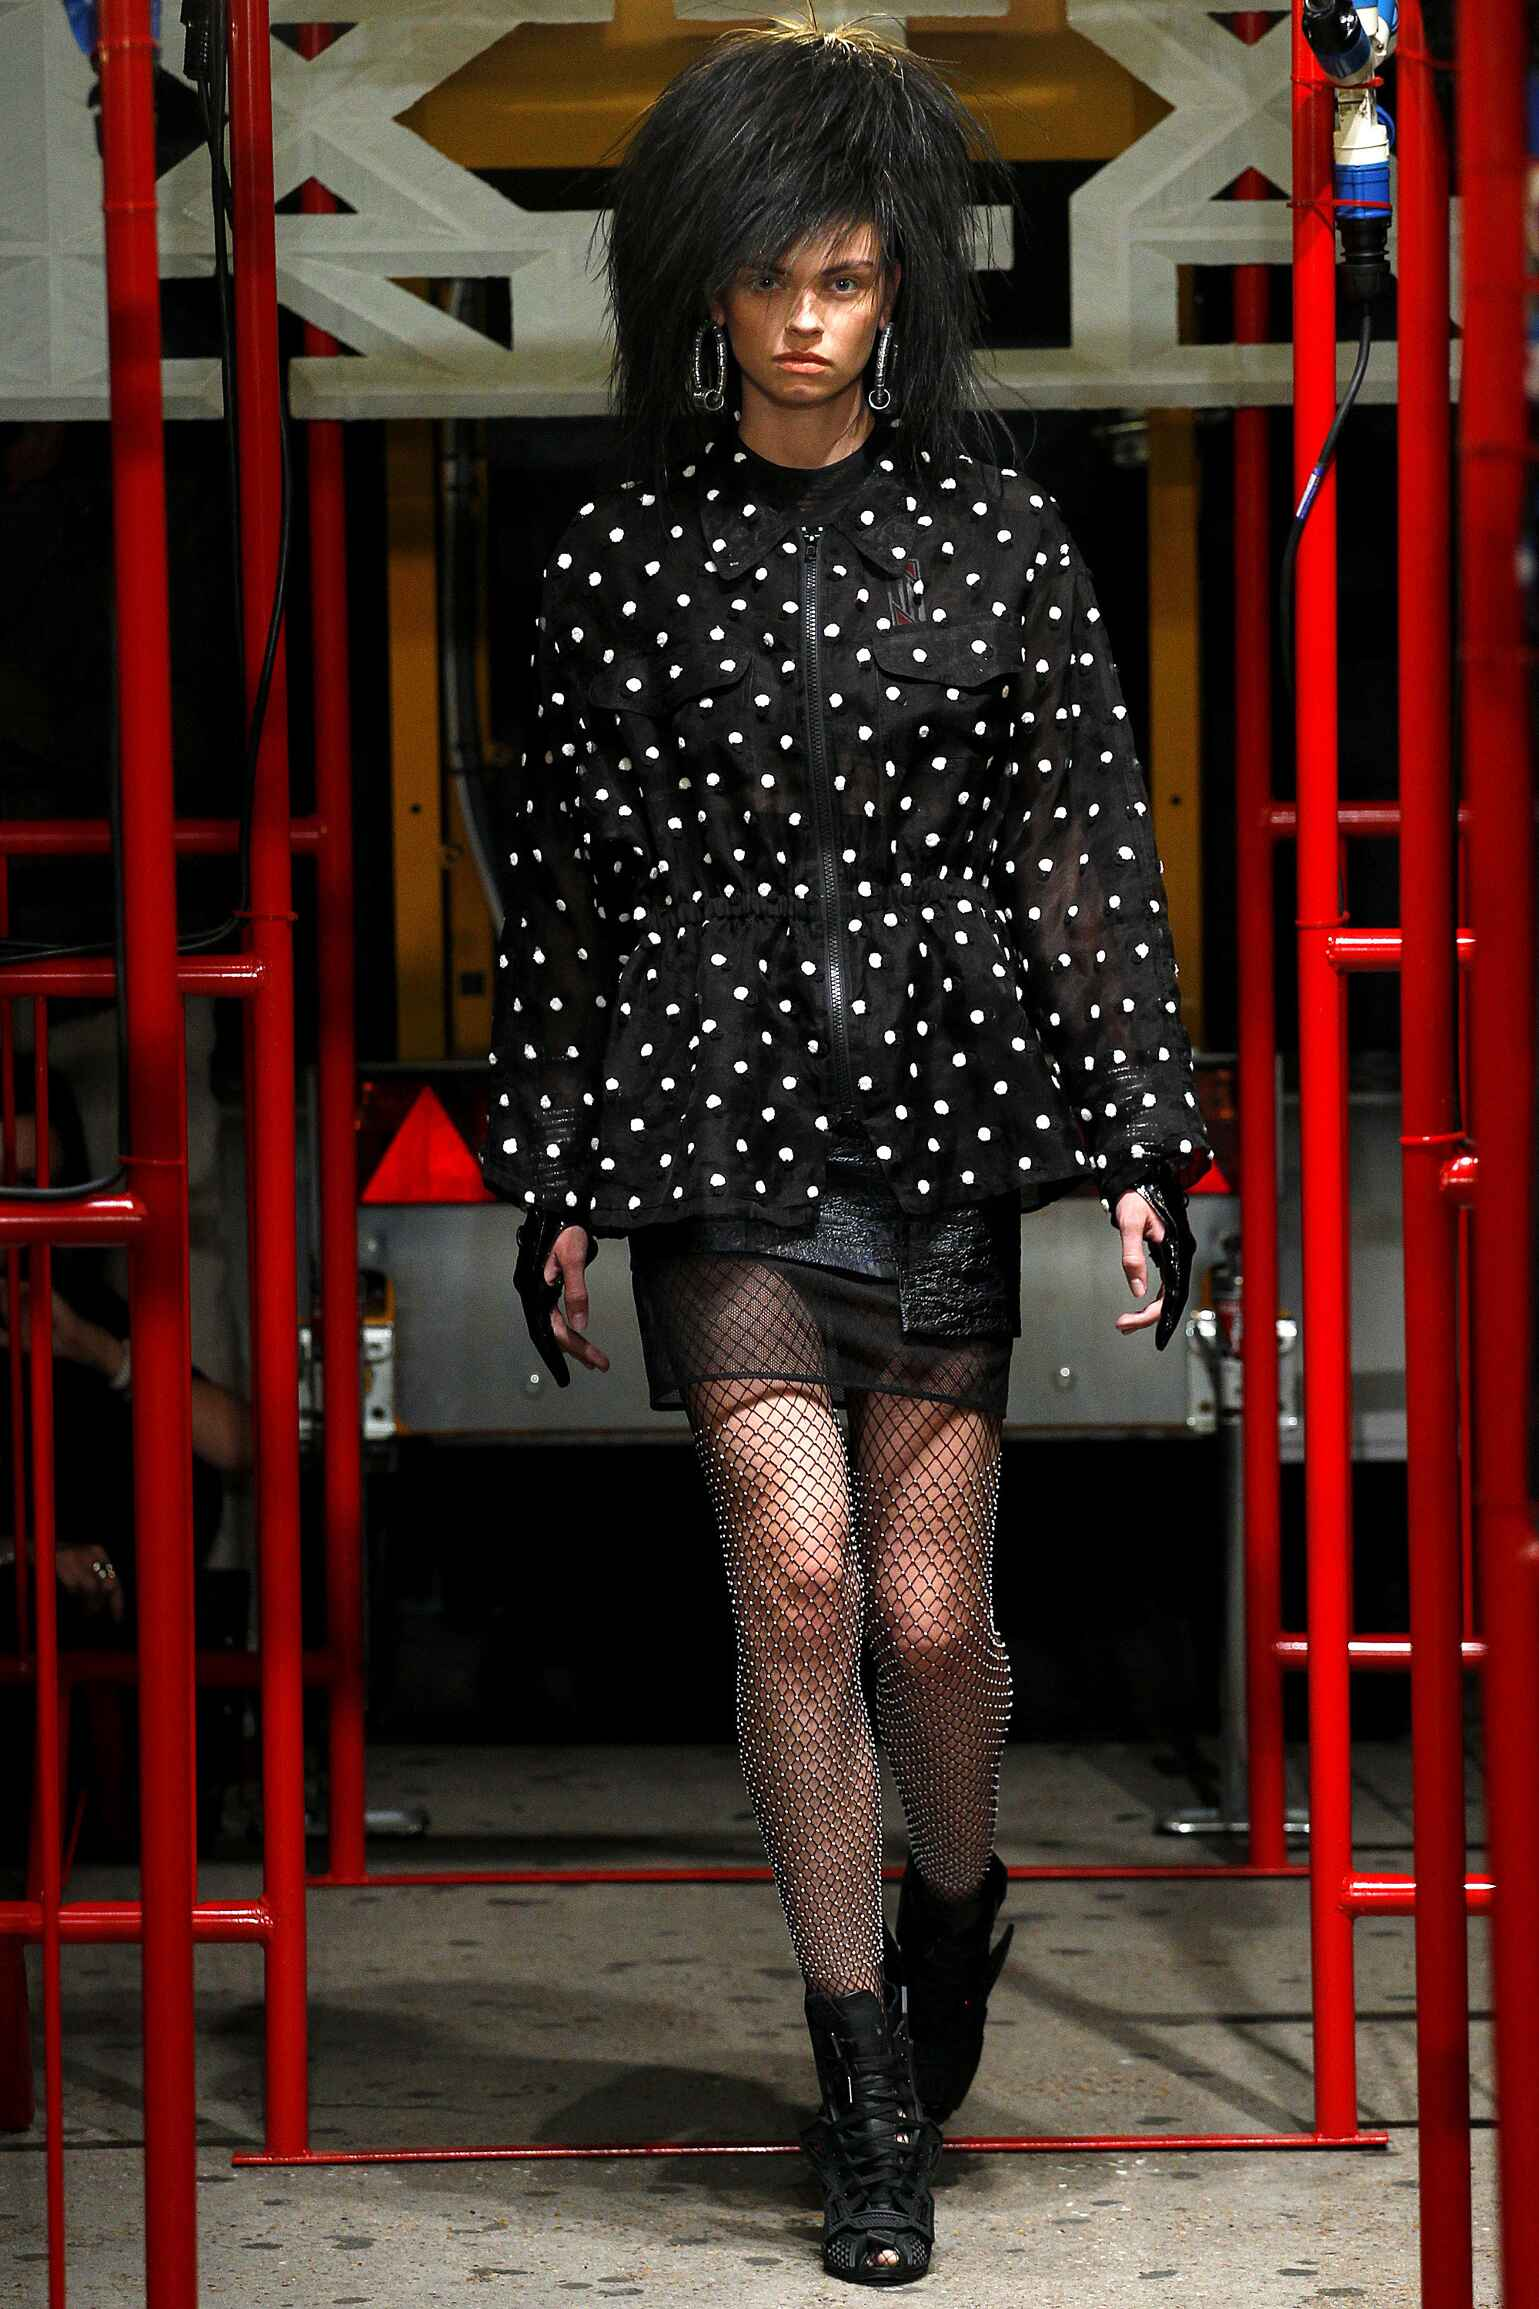 Catwalk KTZ Spring Summer 2016 Women's Collection London Fashion Week